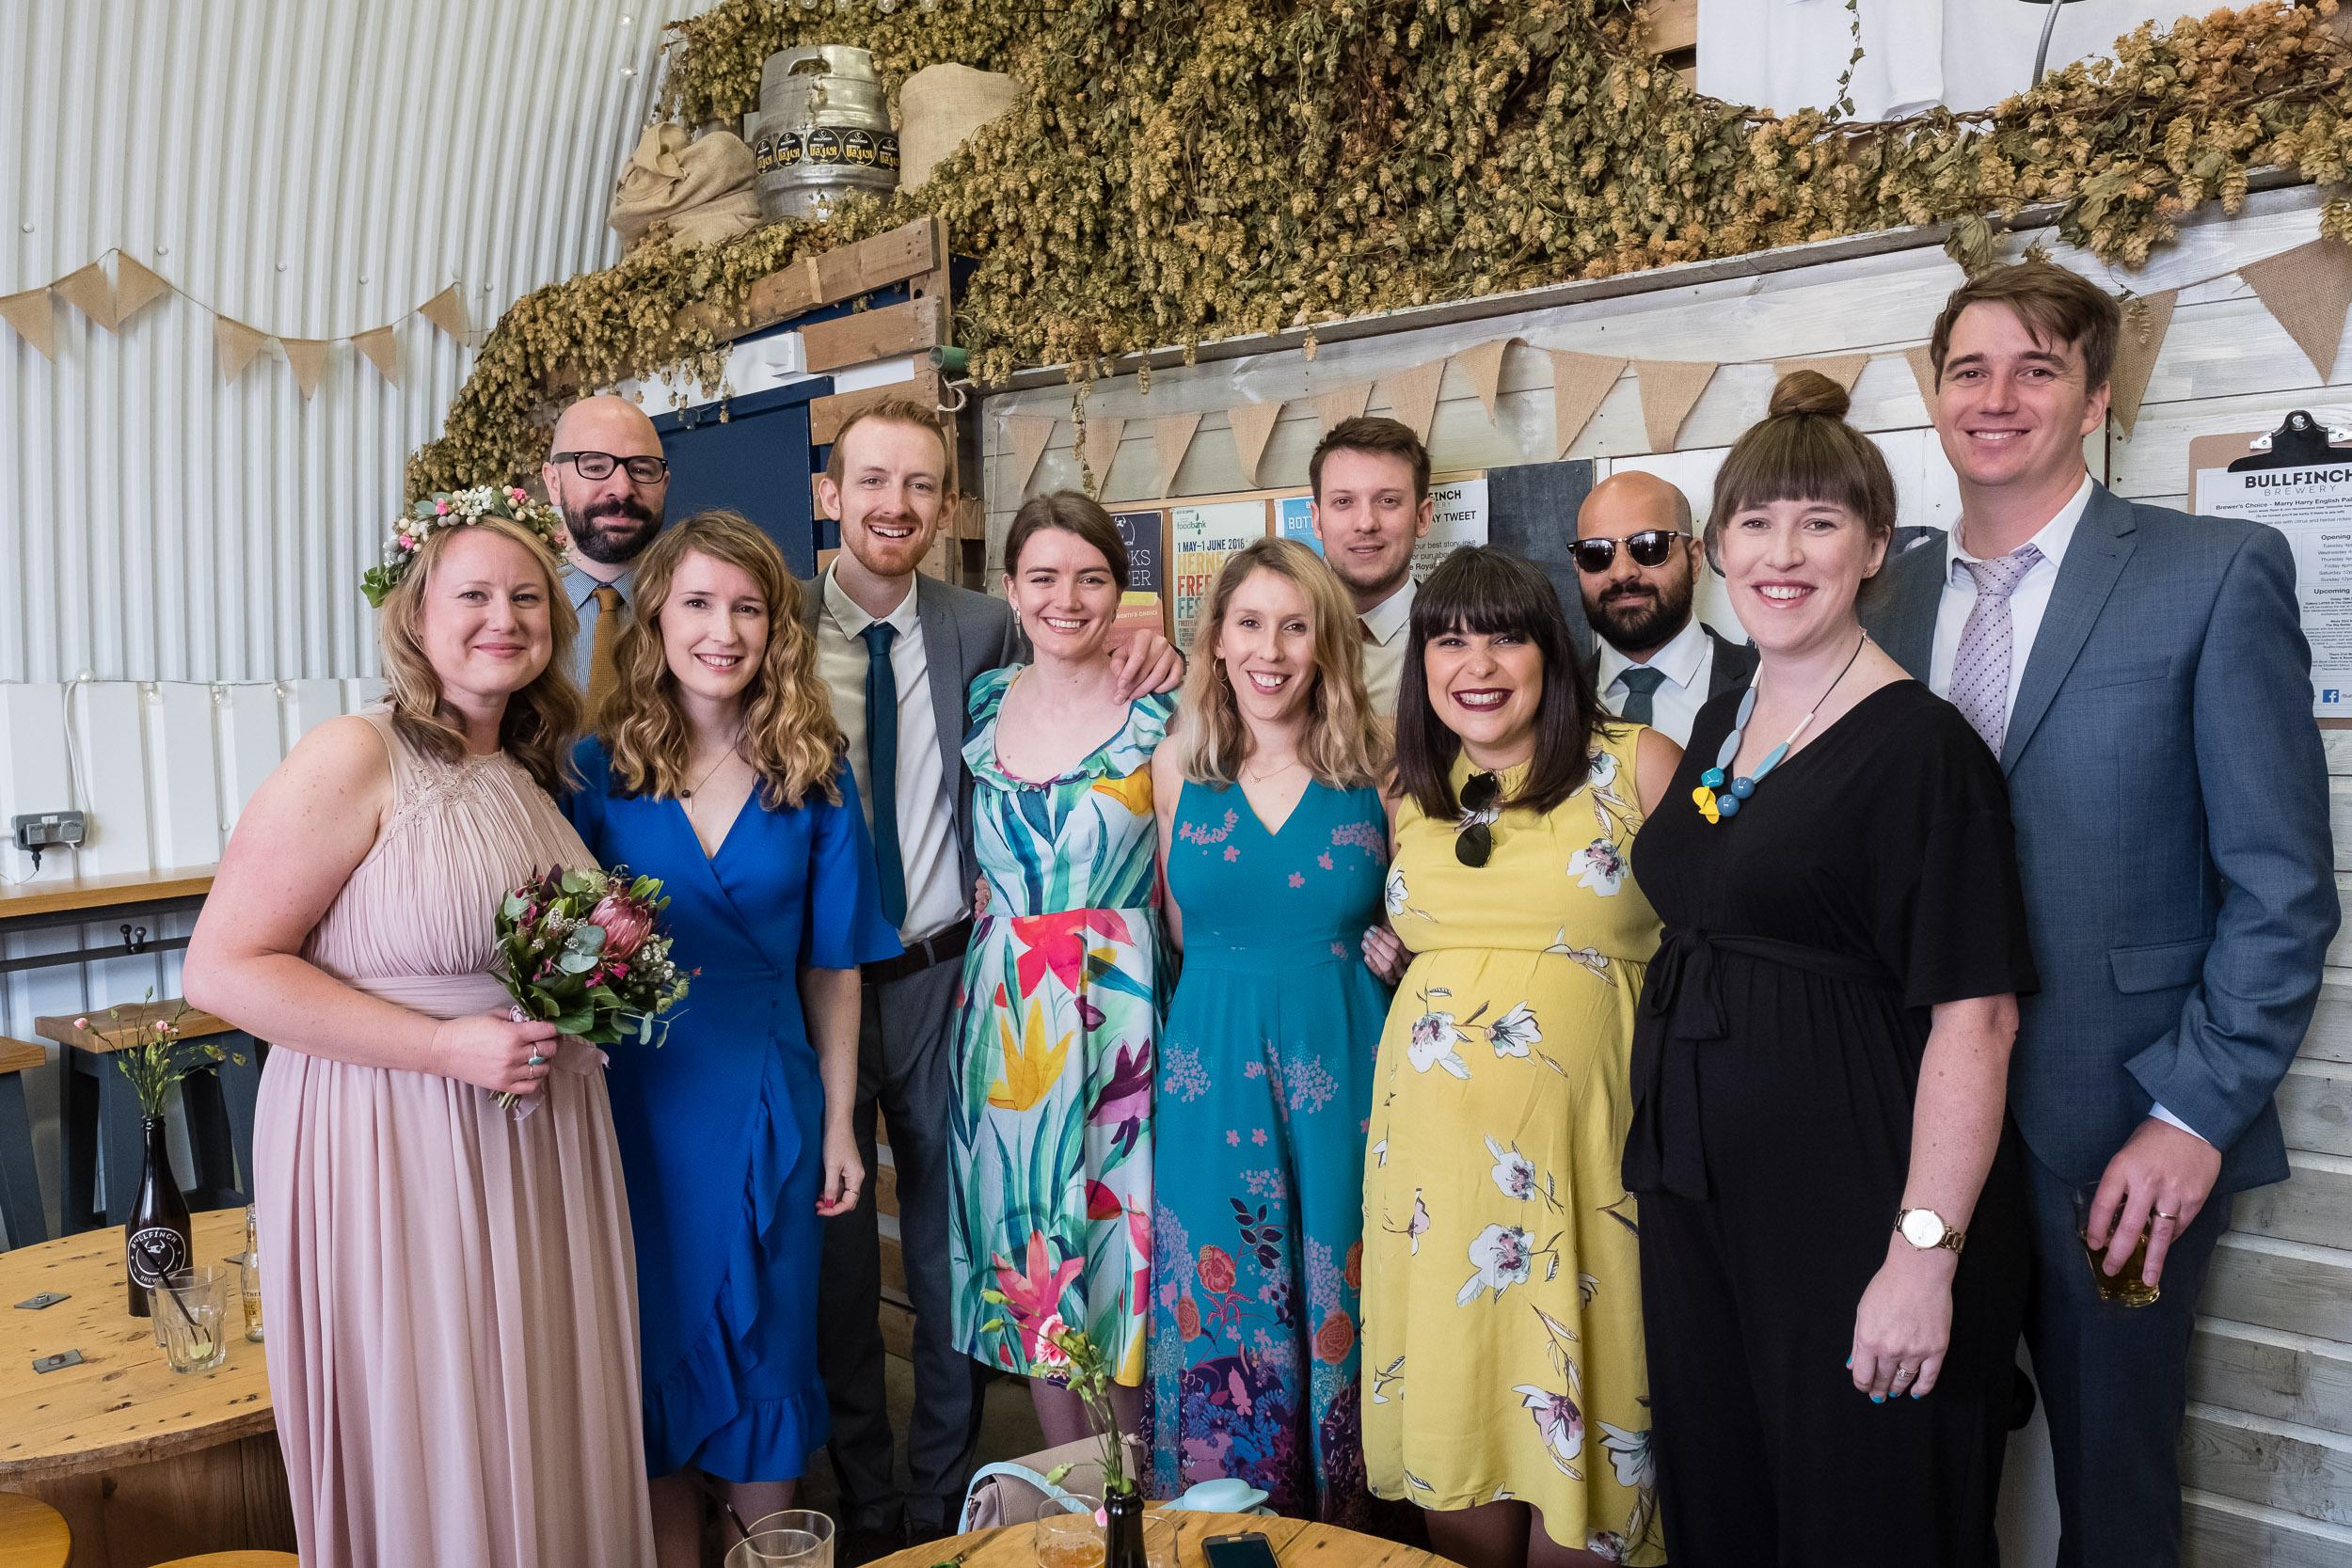 brockwell-lido-brixton-herne-hill-wedding-096.jpg